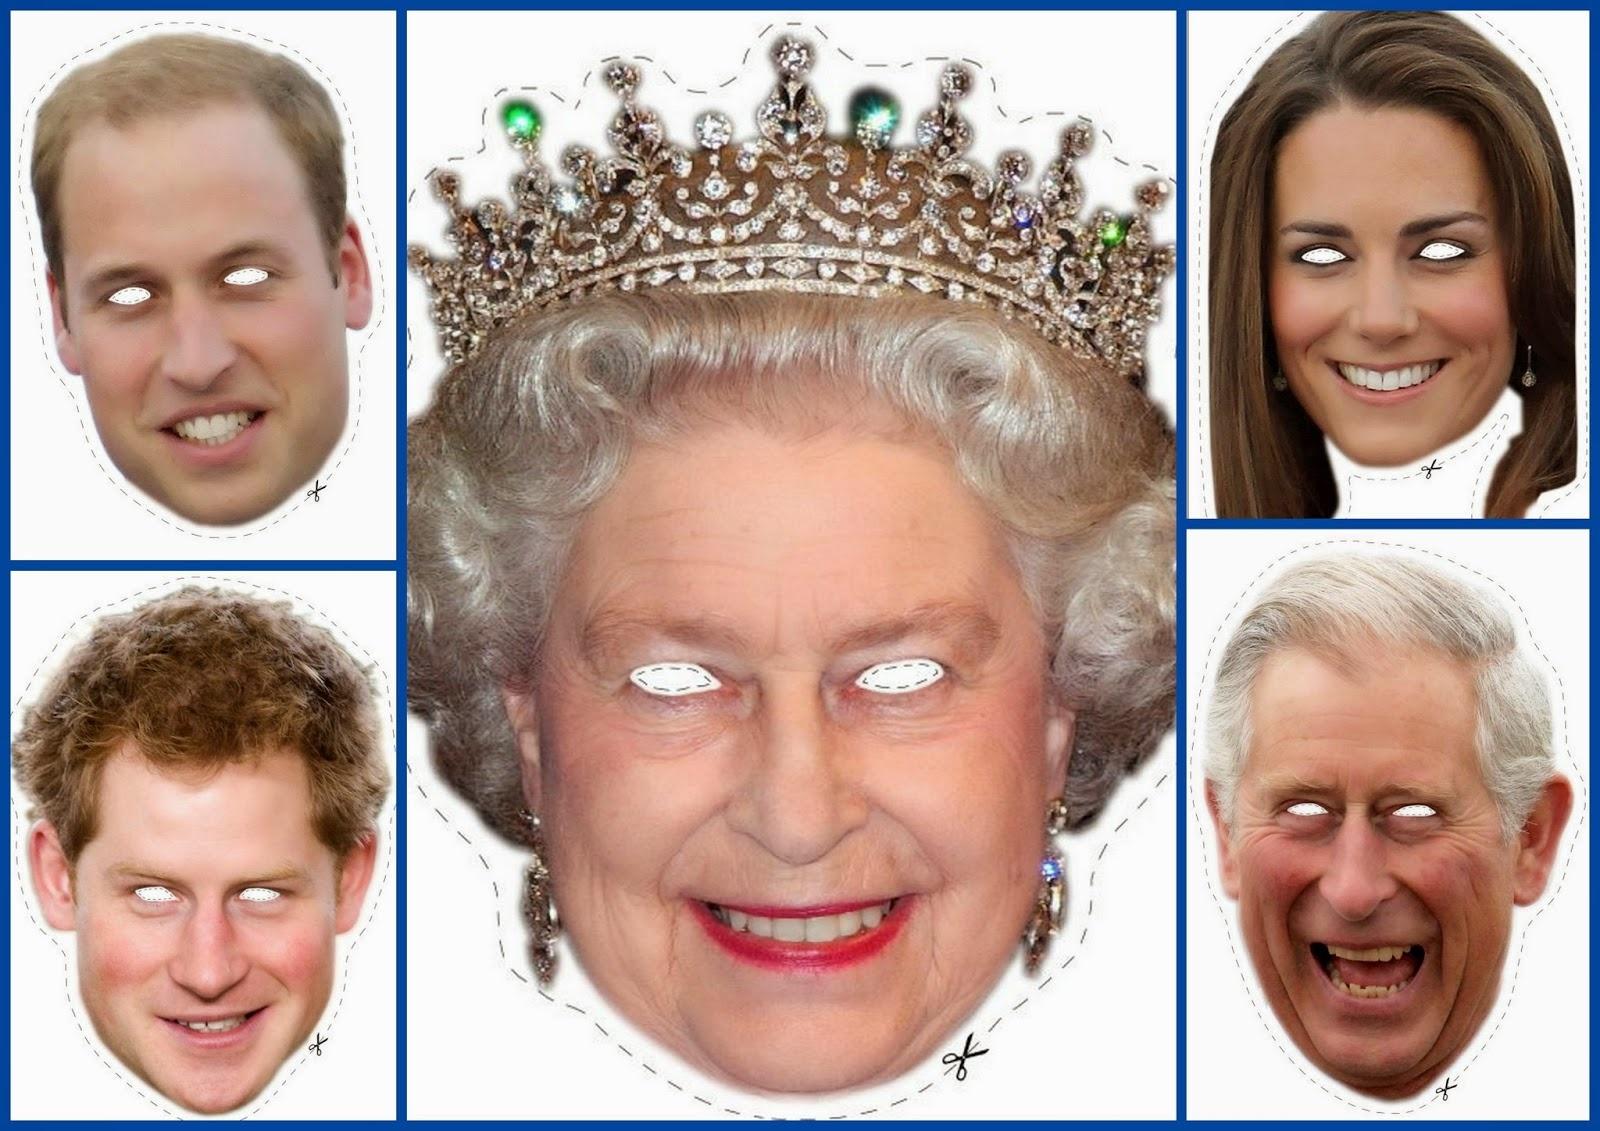 English Royal Family Free Printable Masks. - Oh My Fiesta! In English - Free Printable Face Masks